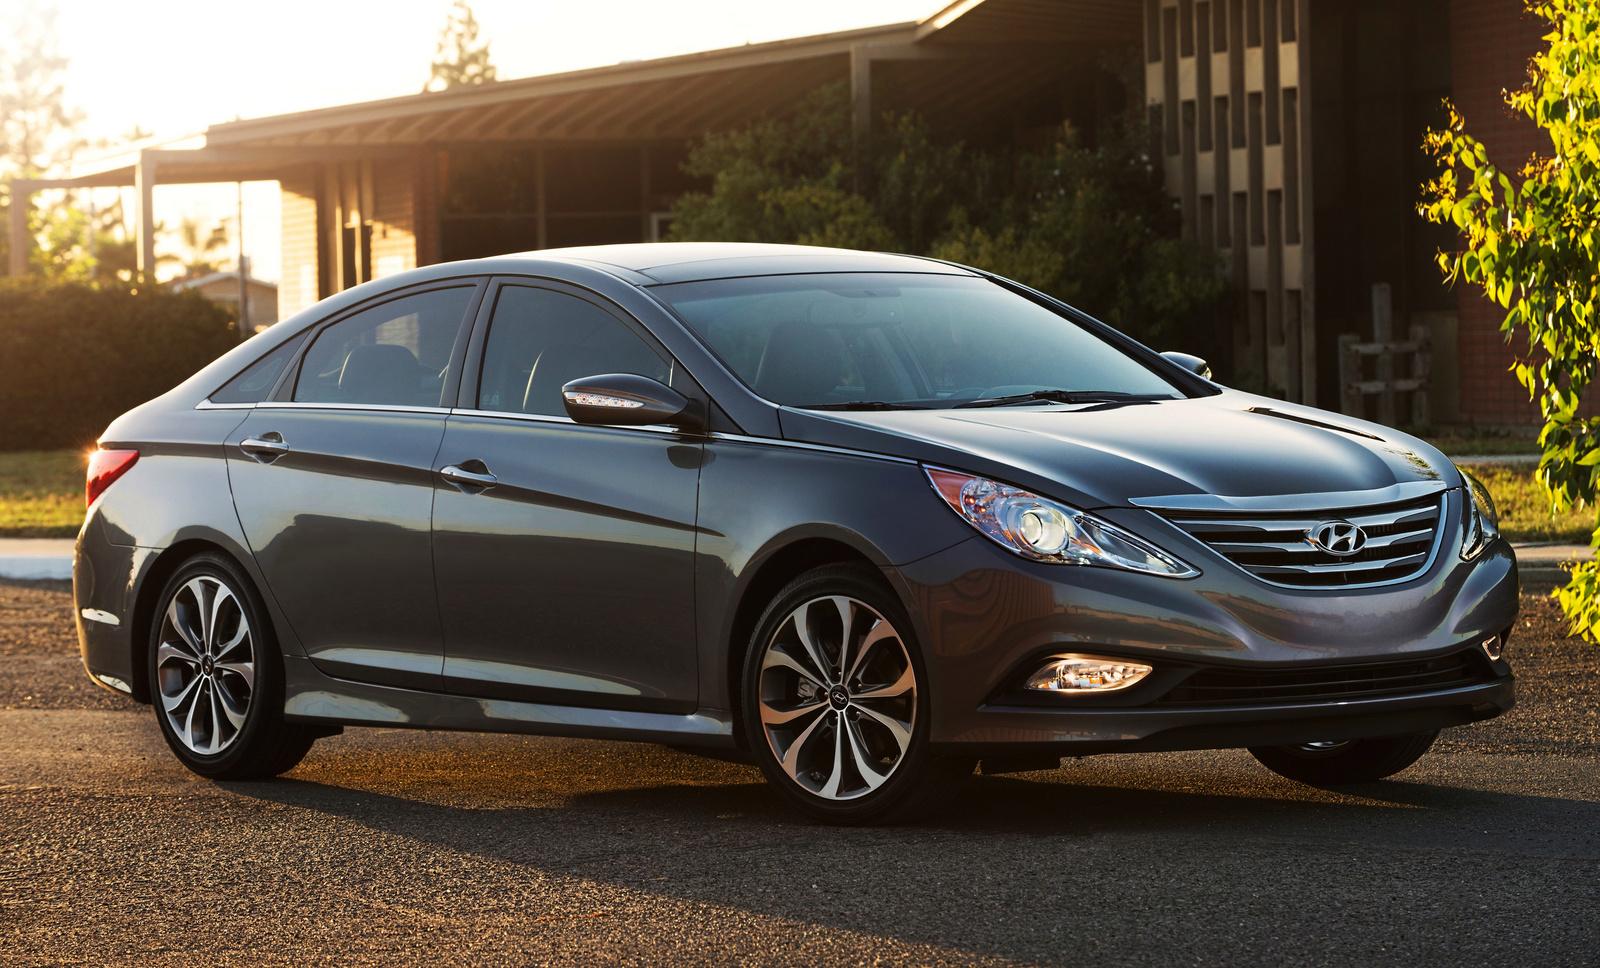 2014 Hyundai Sonata Overview CarGurus